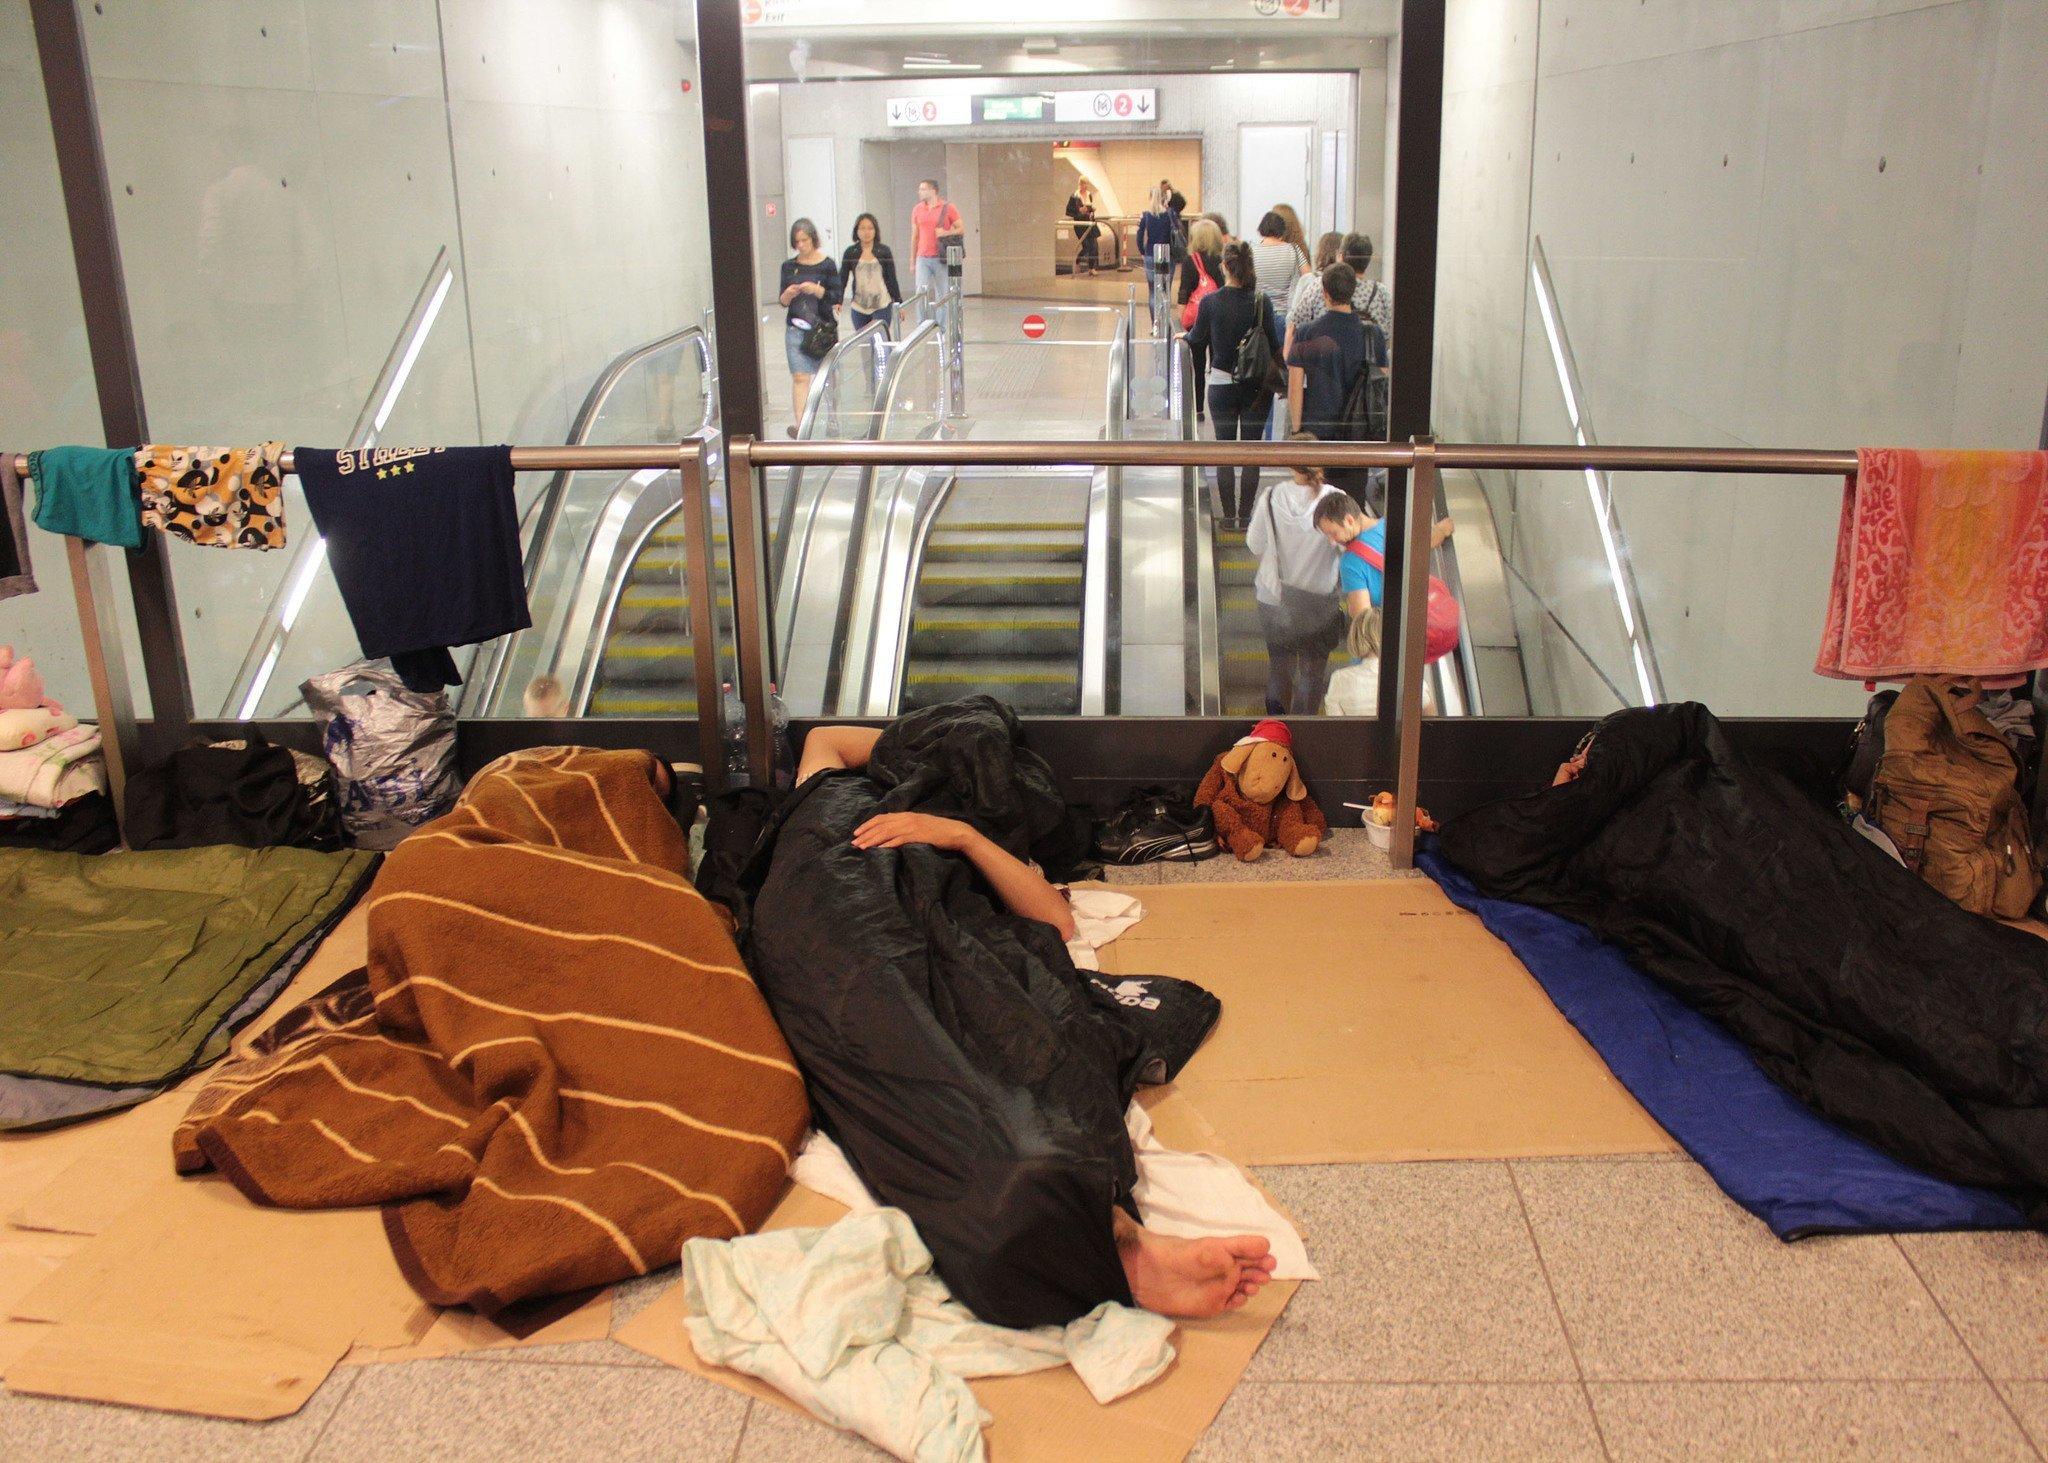 Budapest Mayor promises action plan on handling migrants